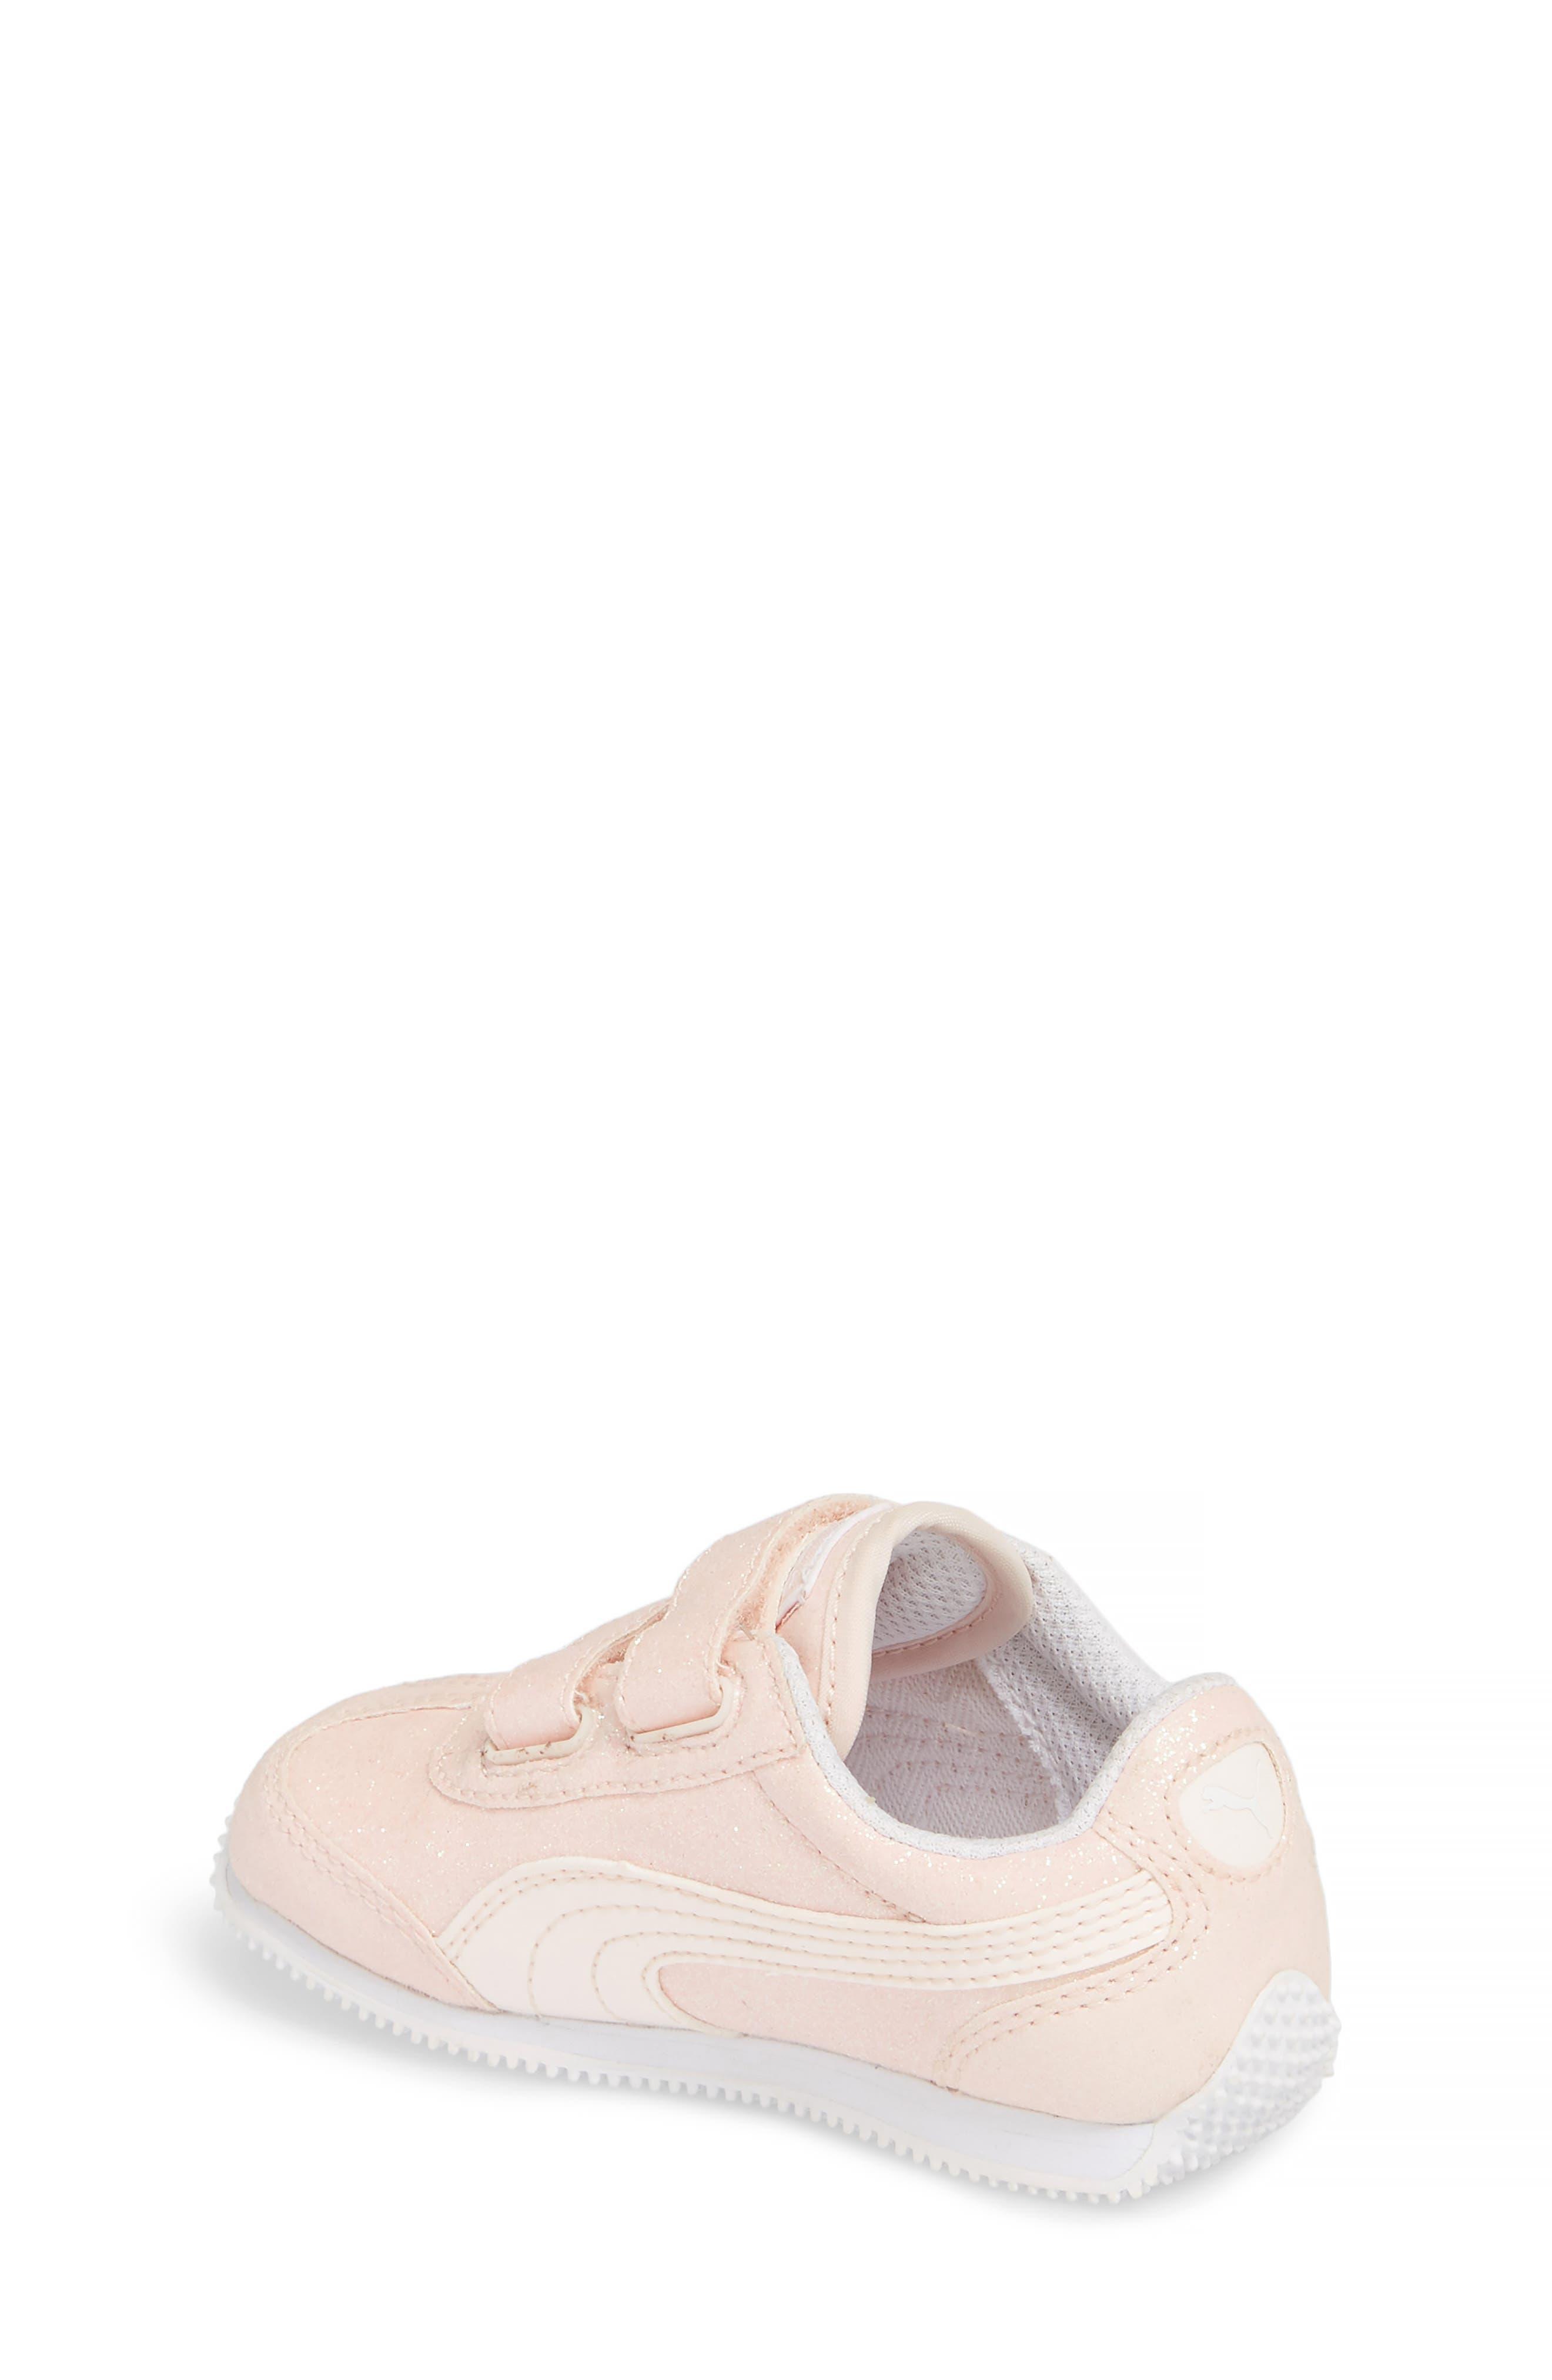 PUMA, Whirlwind Glitz Sneaker, Alternate thumbnail 2, color, 690